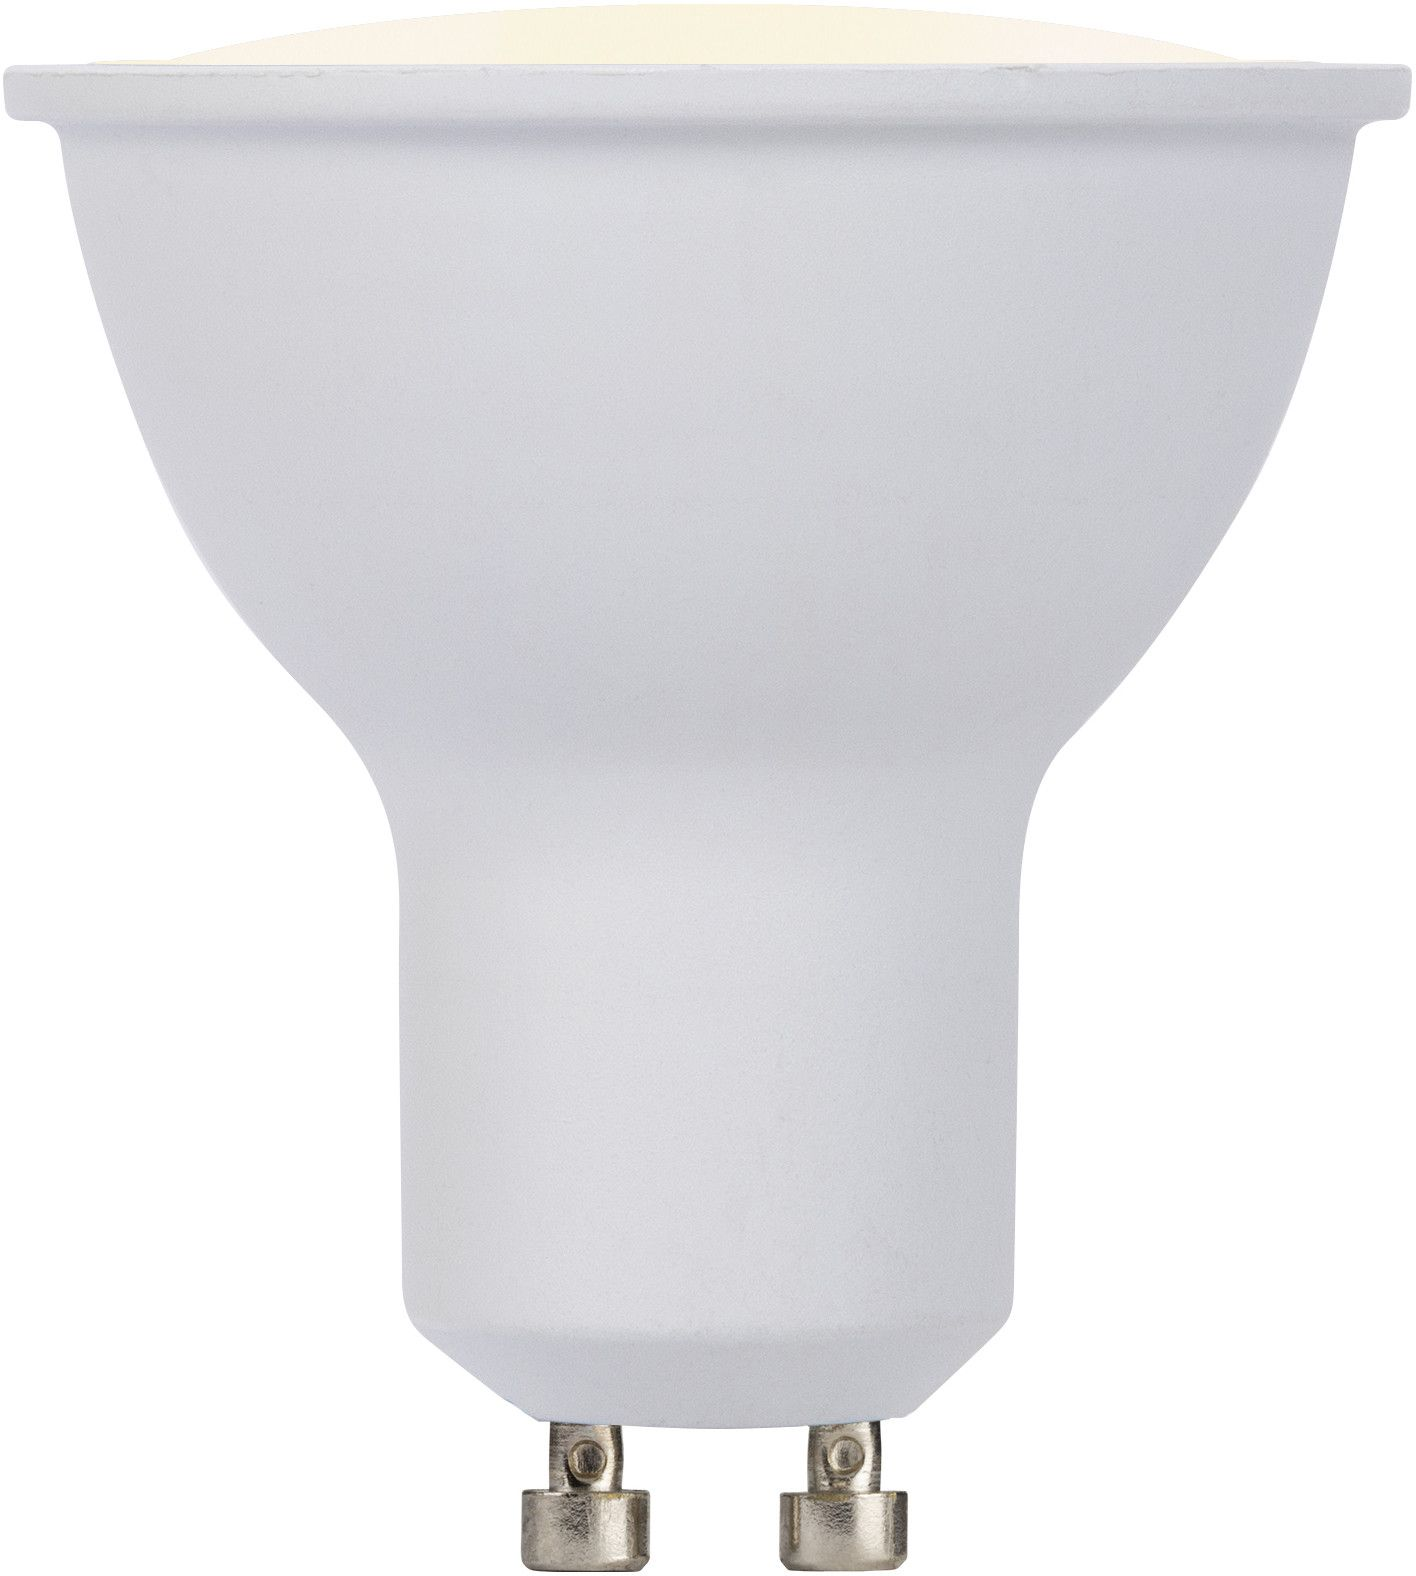 TCP Smart LED Lamp White GU10